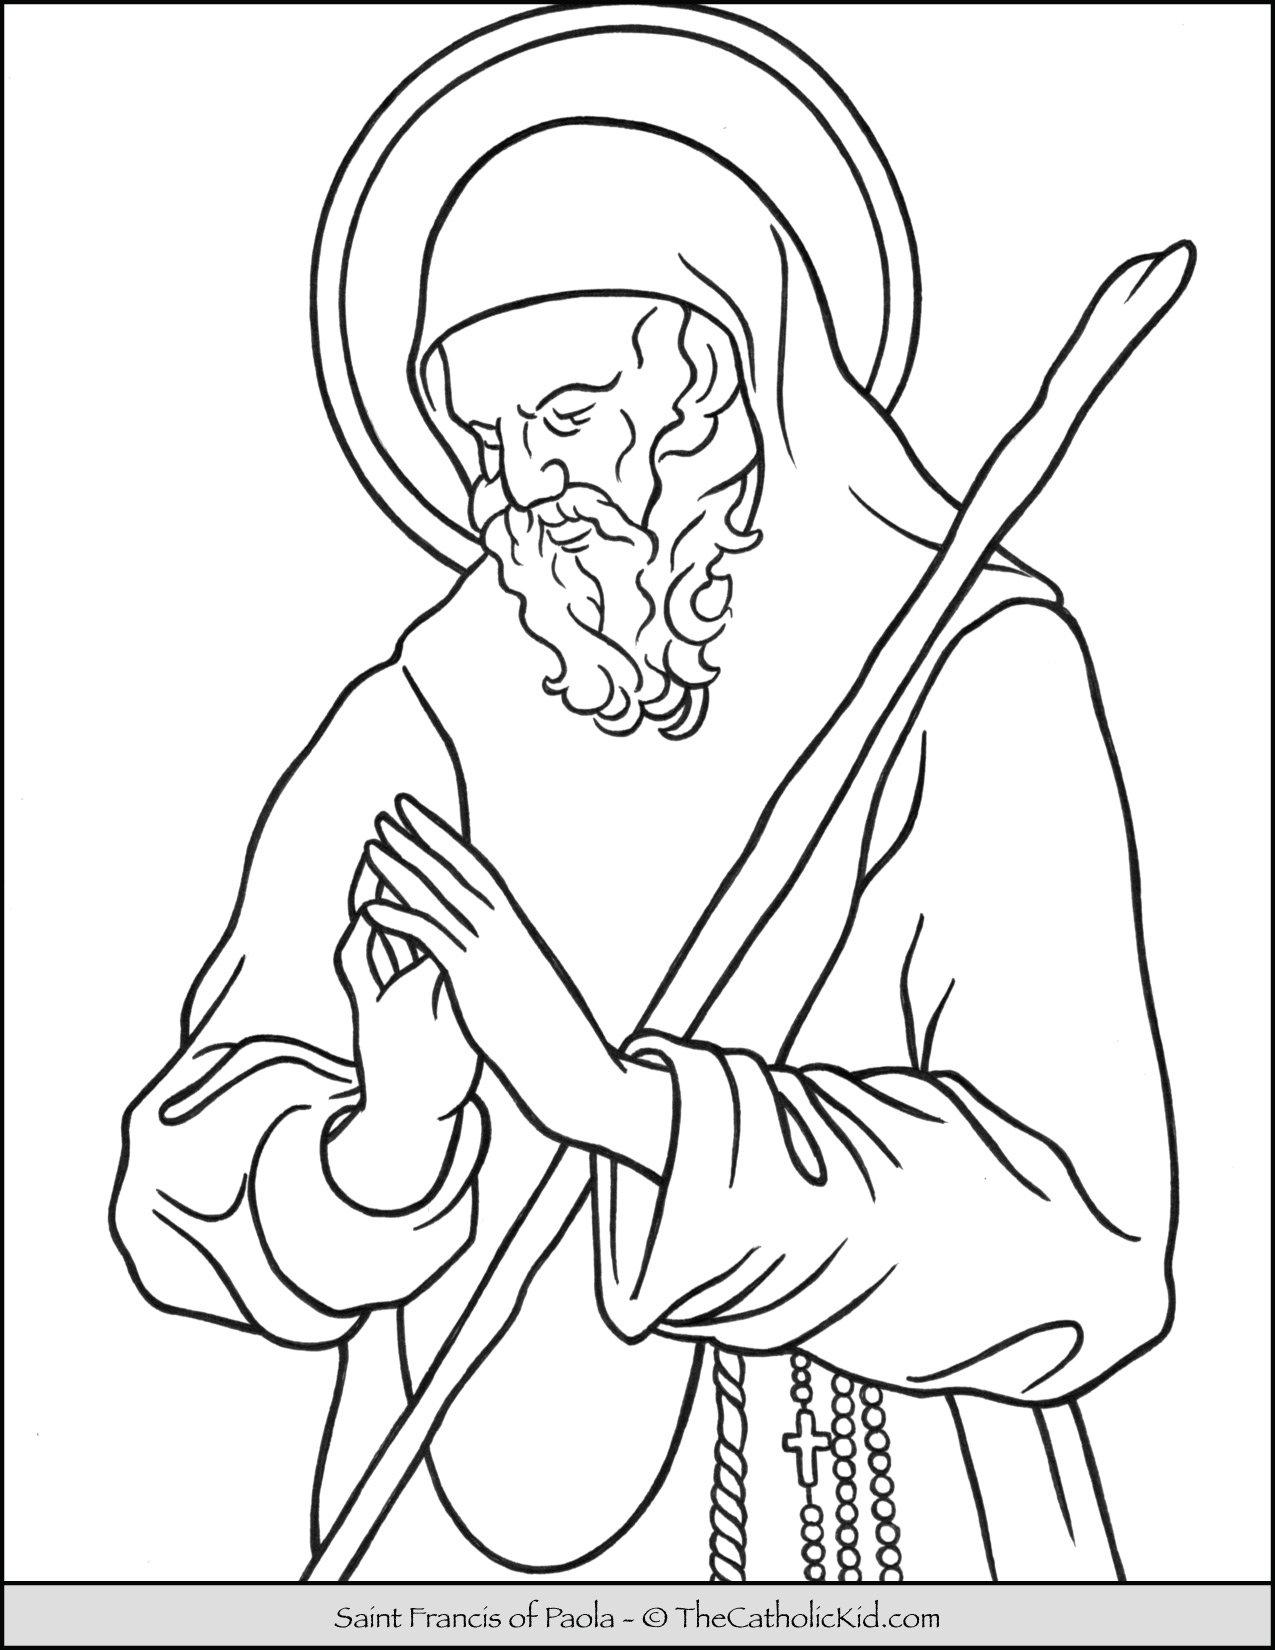 Saint Francis of Paola Coloring Page